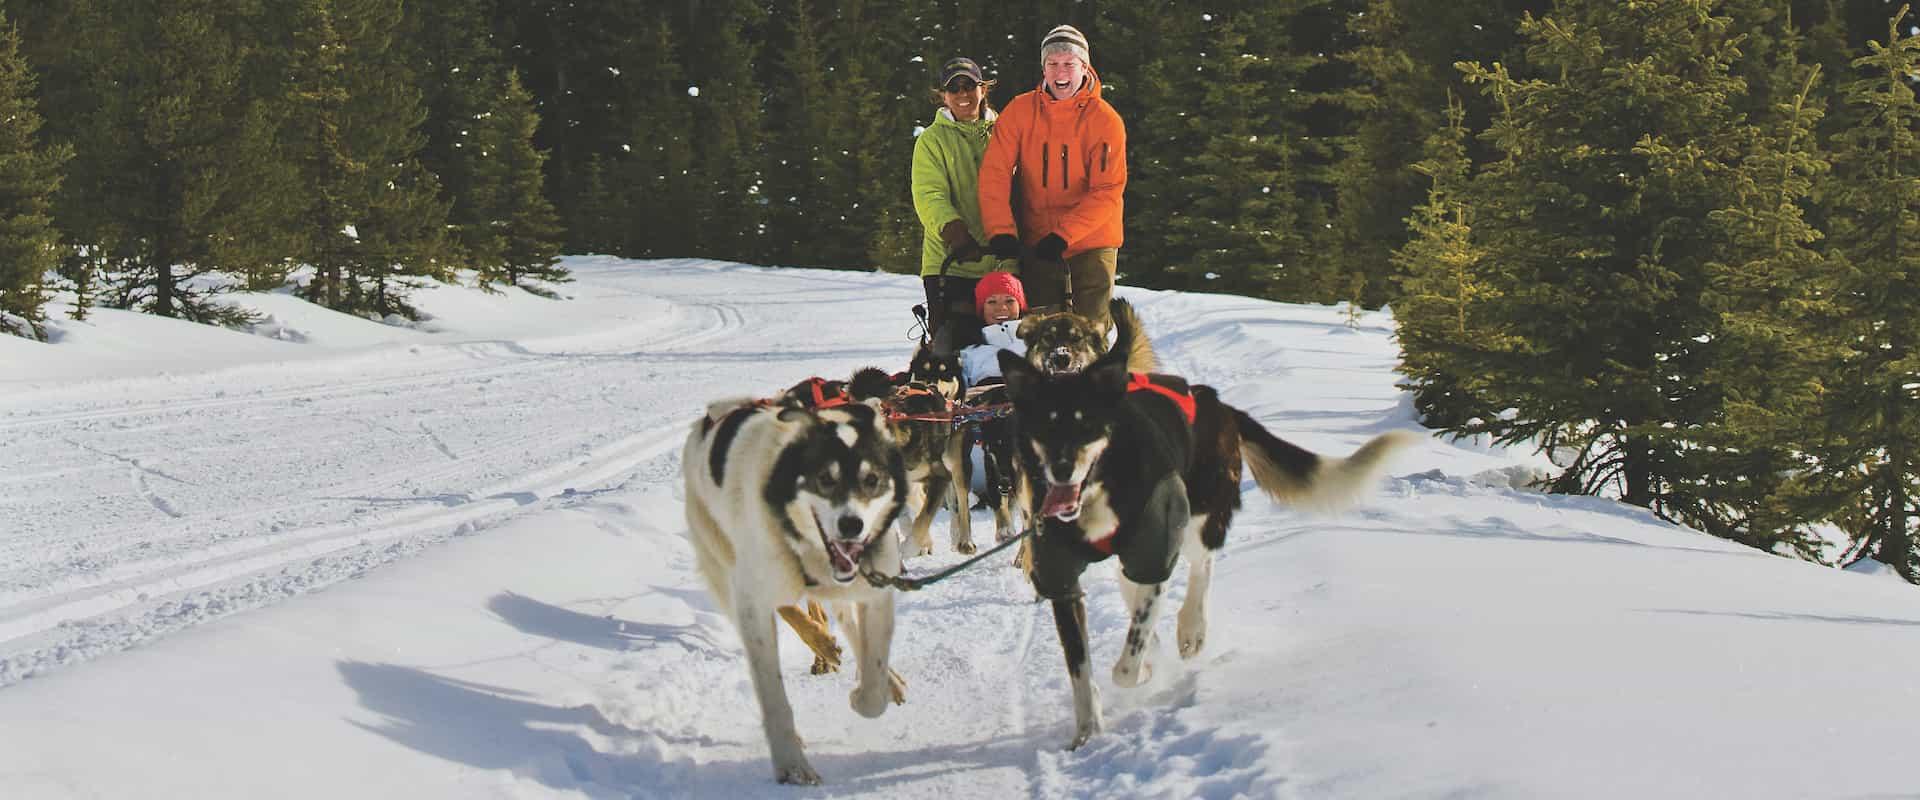 Dogsledding – Great Alone 1.5 Hrs